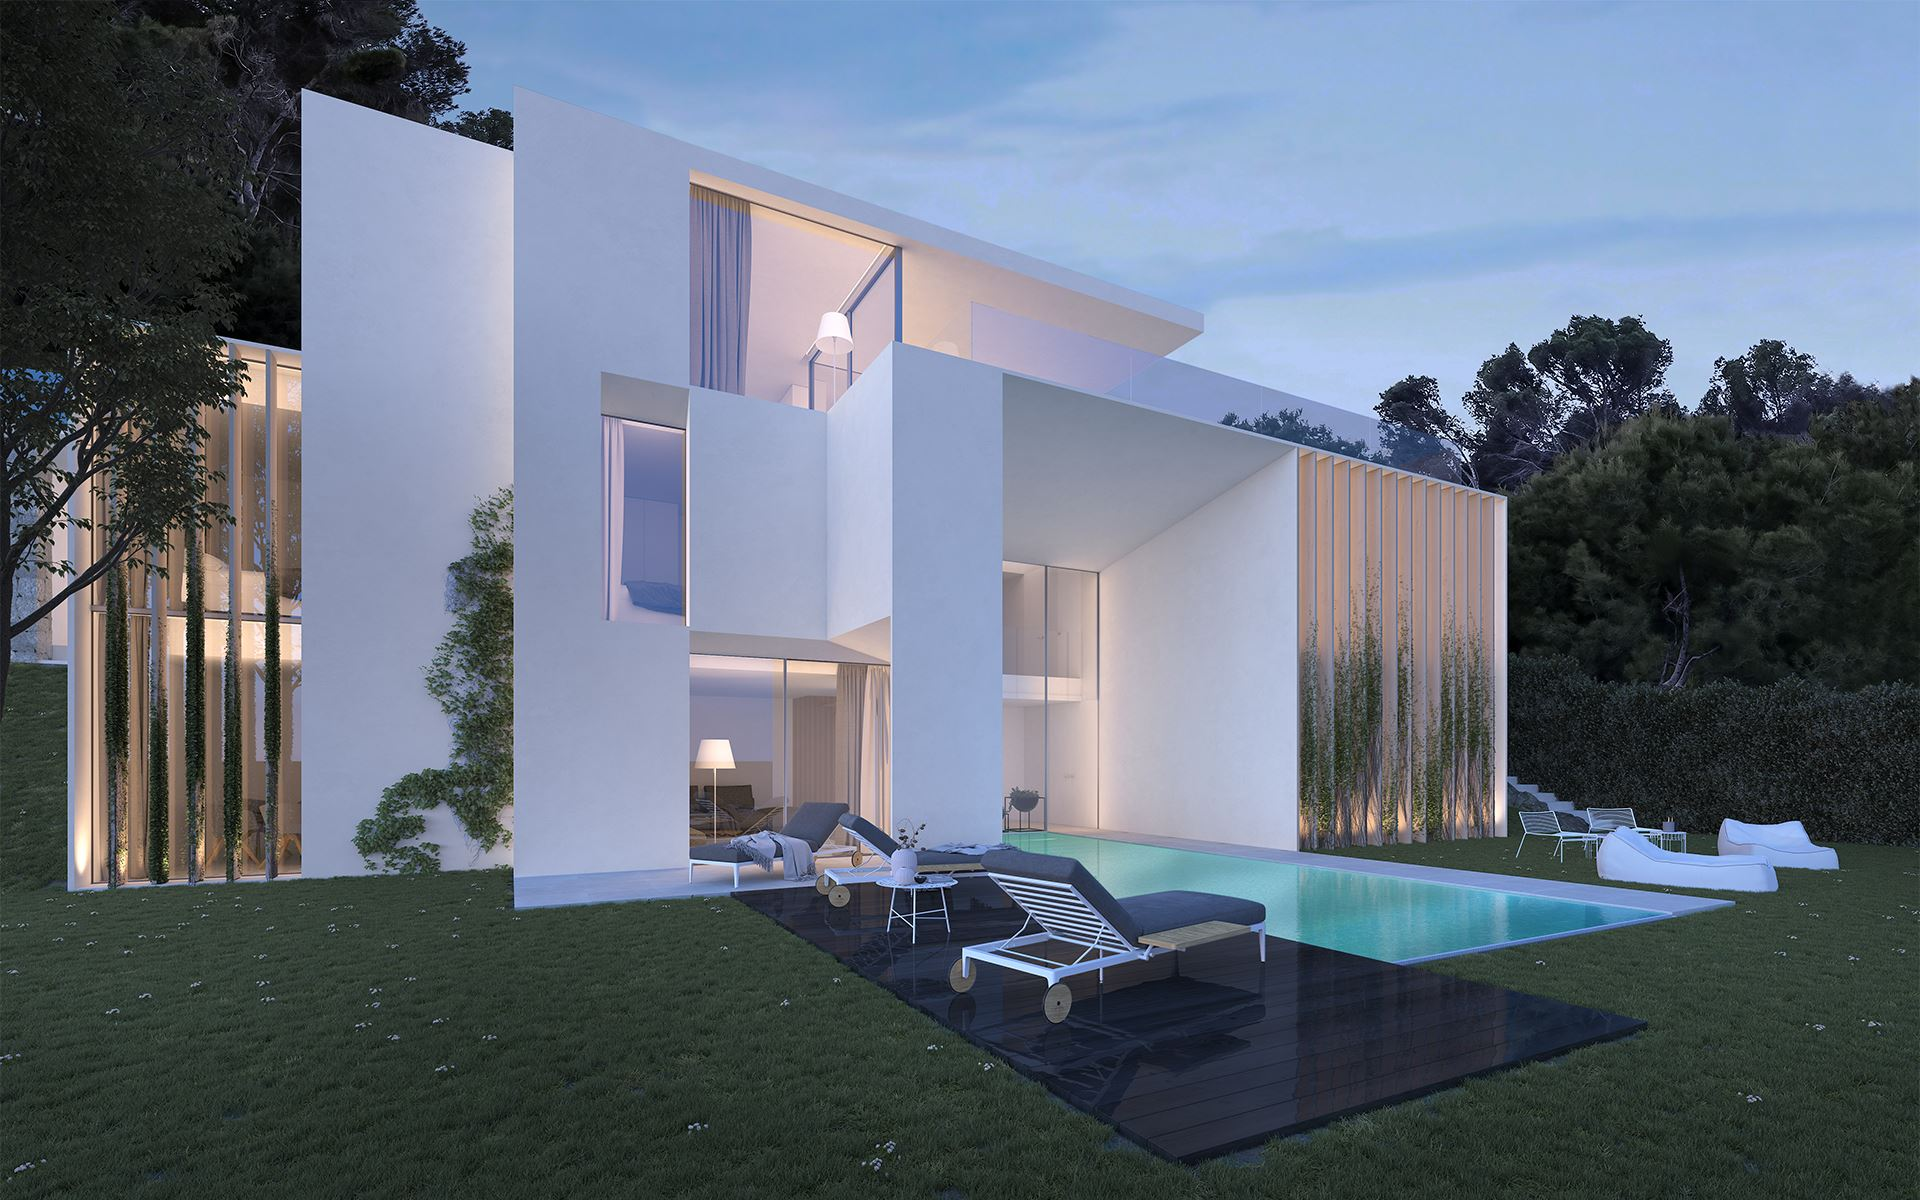 Proyecto de arquitectura Denia